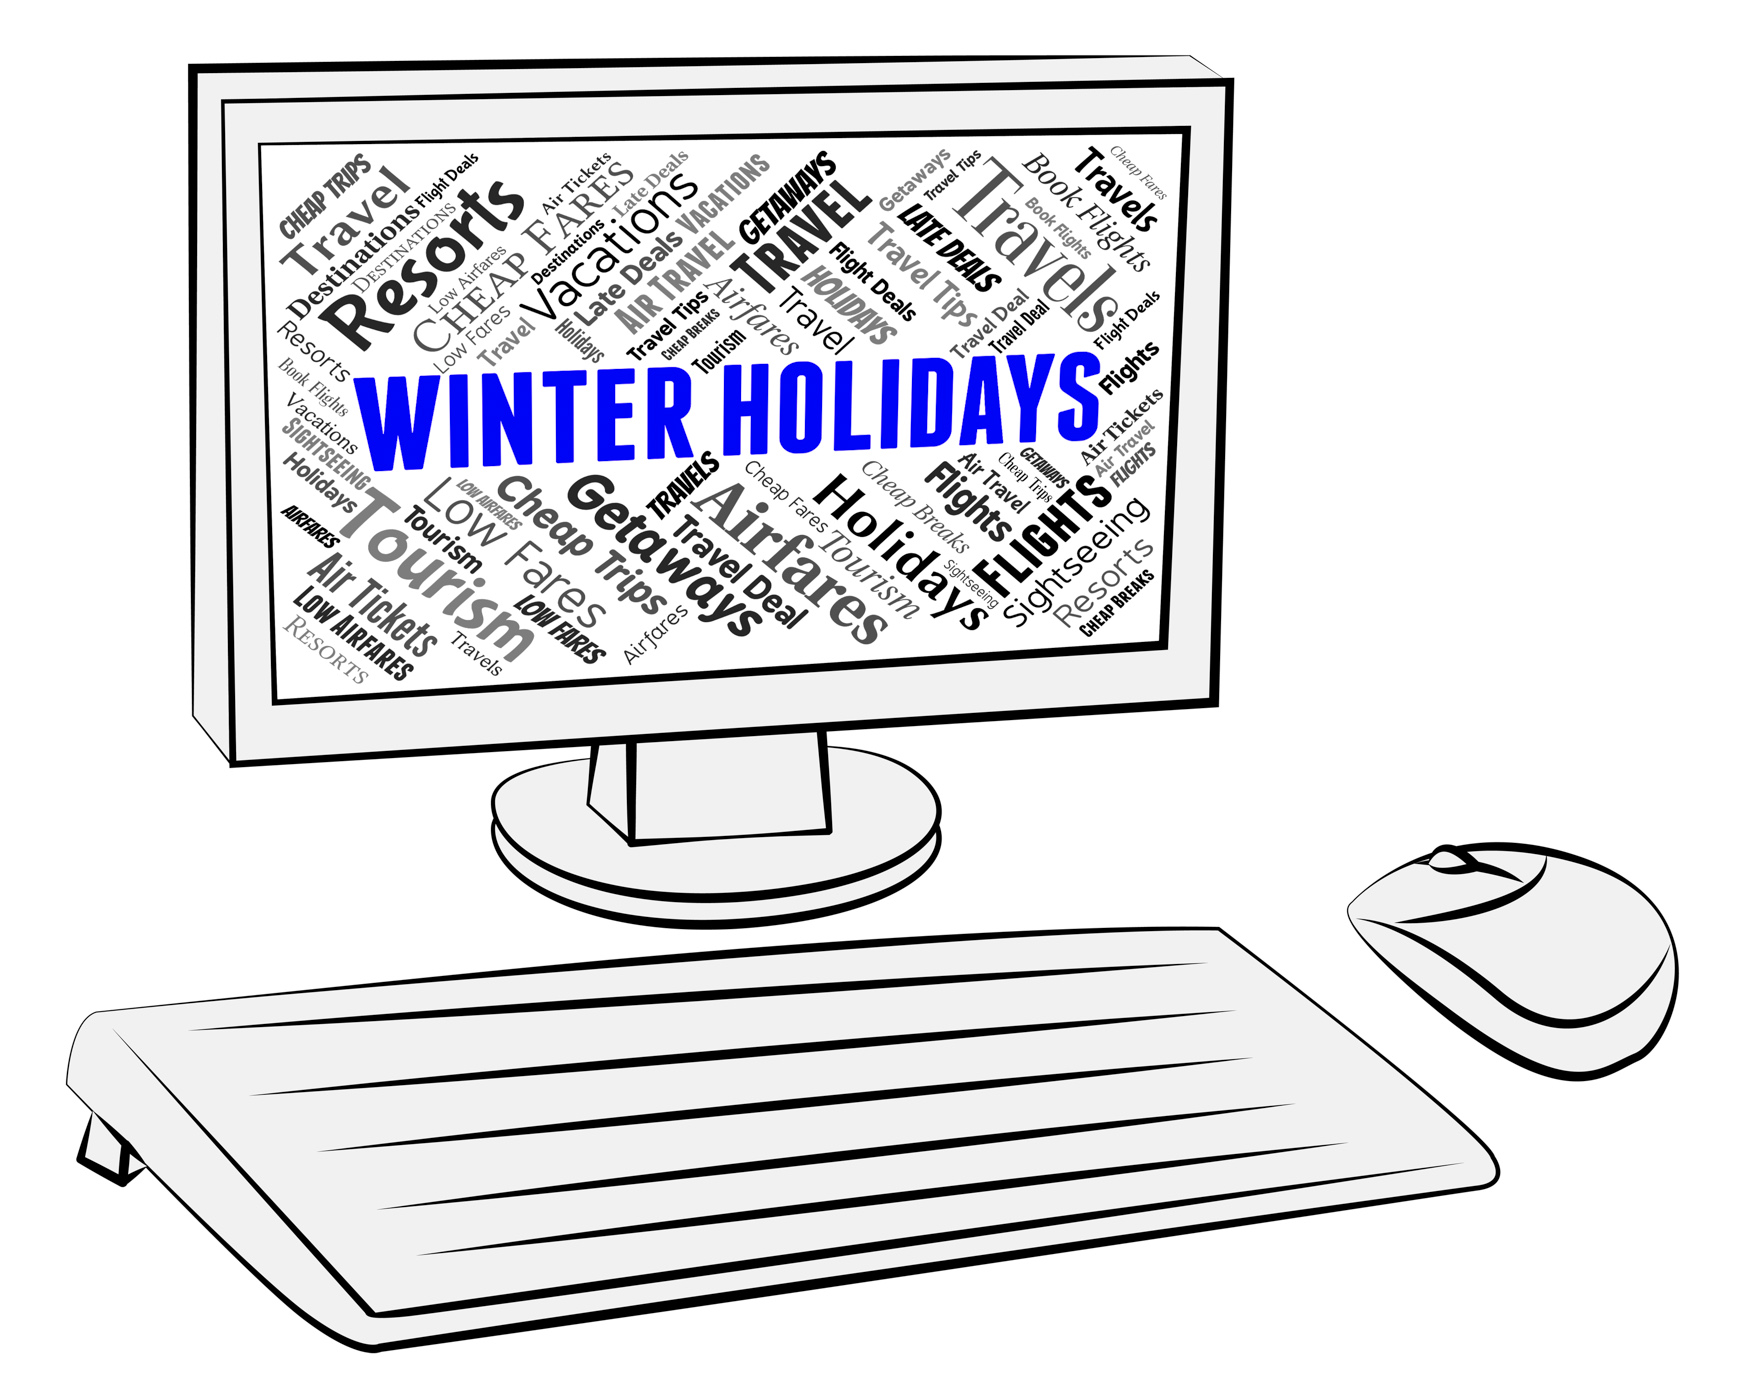 Winter holidays indicates getaway pc and computer photo